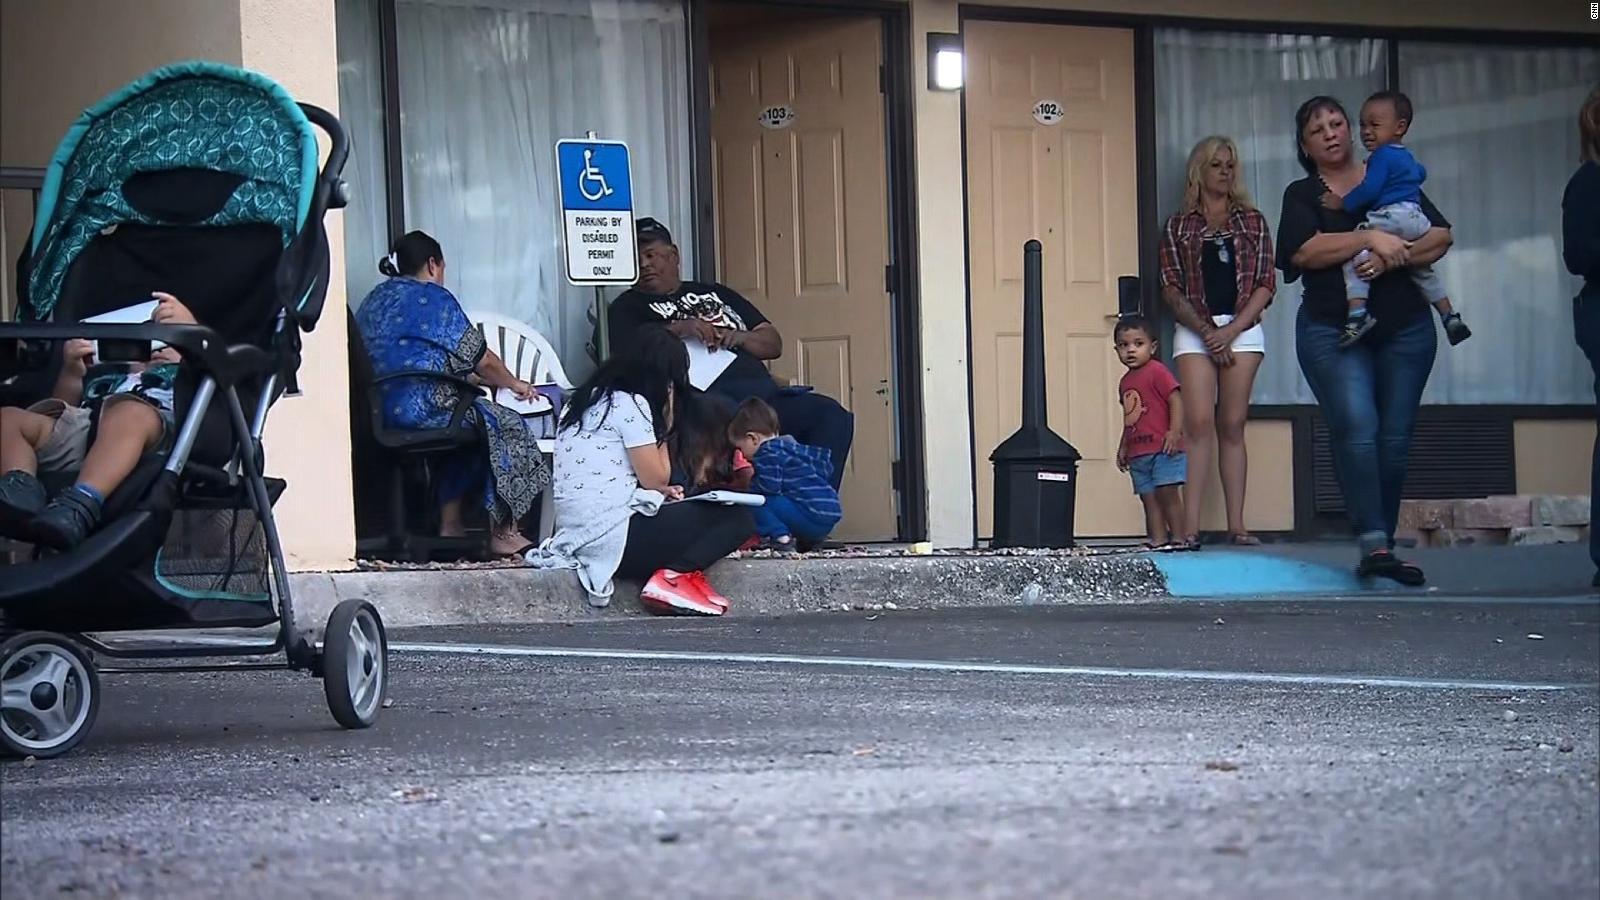 Hurricane Maria evacuees living in FL motels